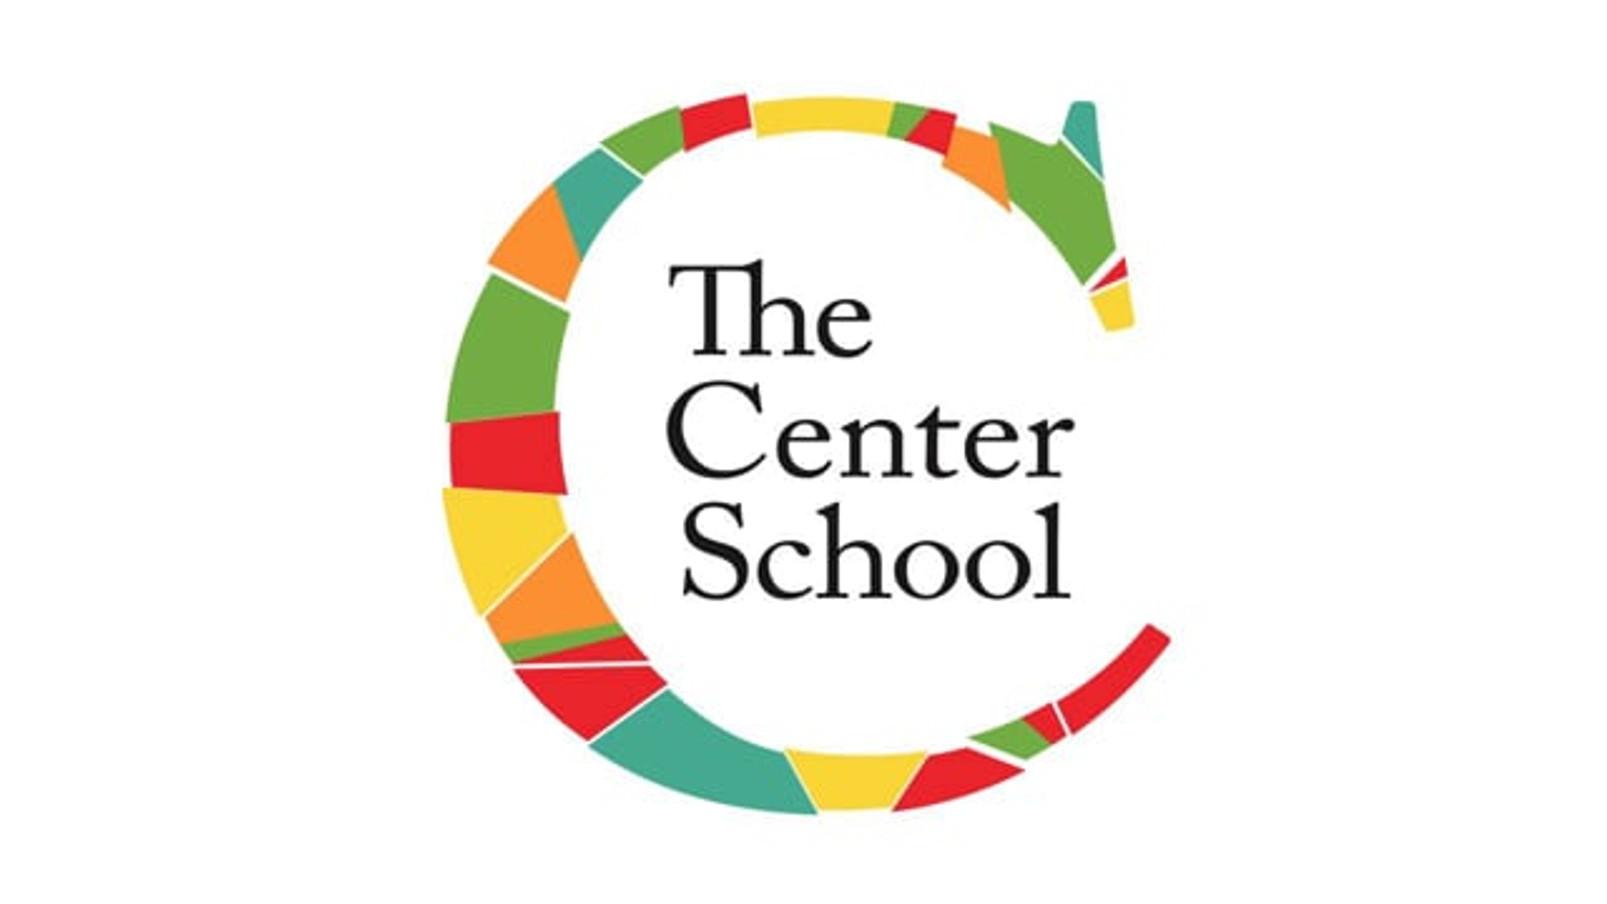 Center School, Greenfield, MA